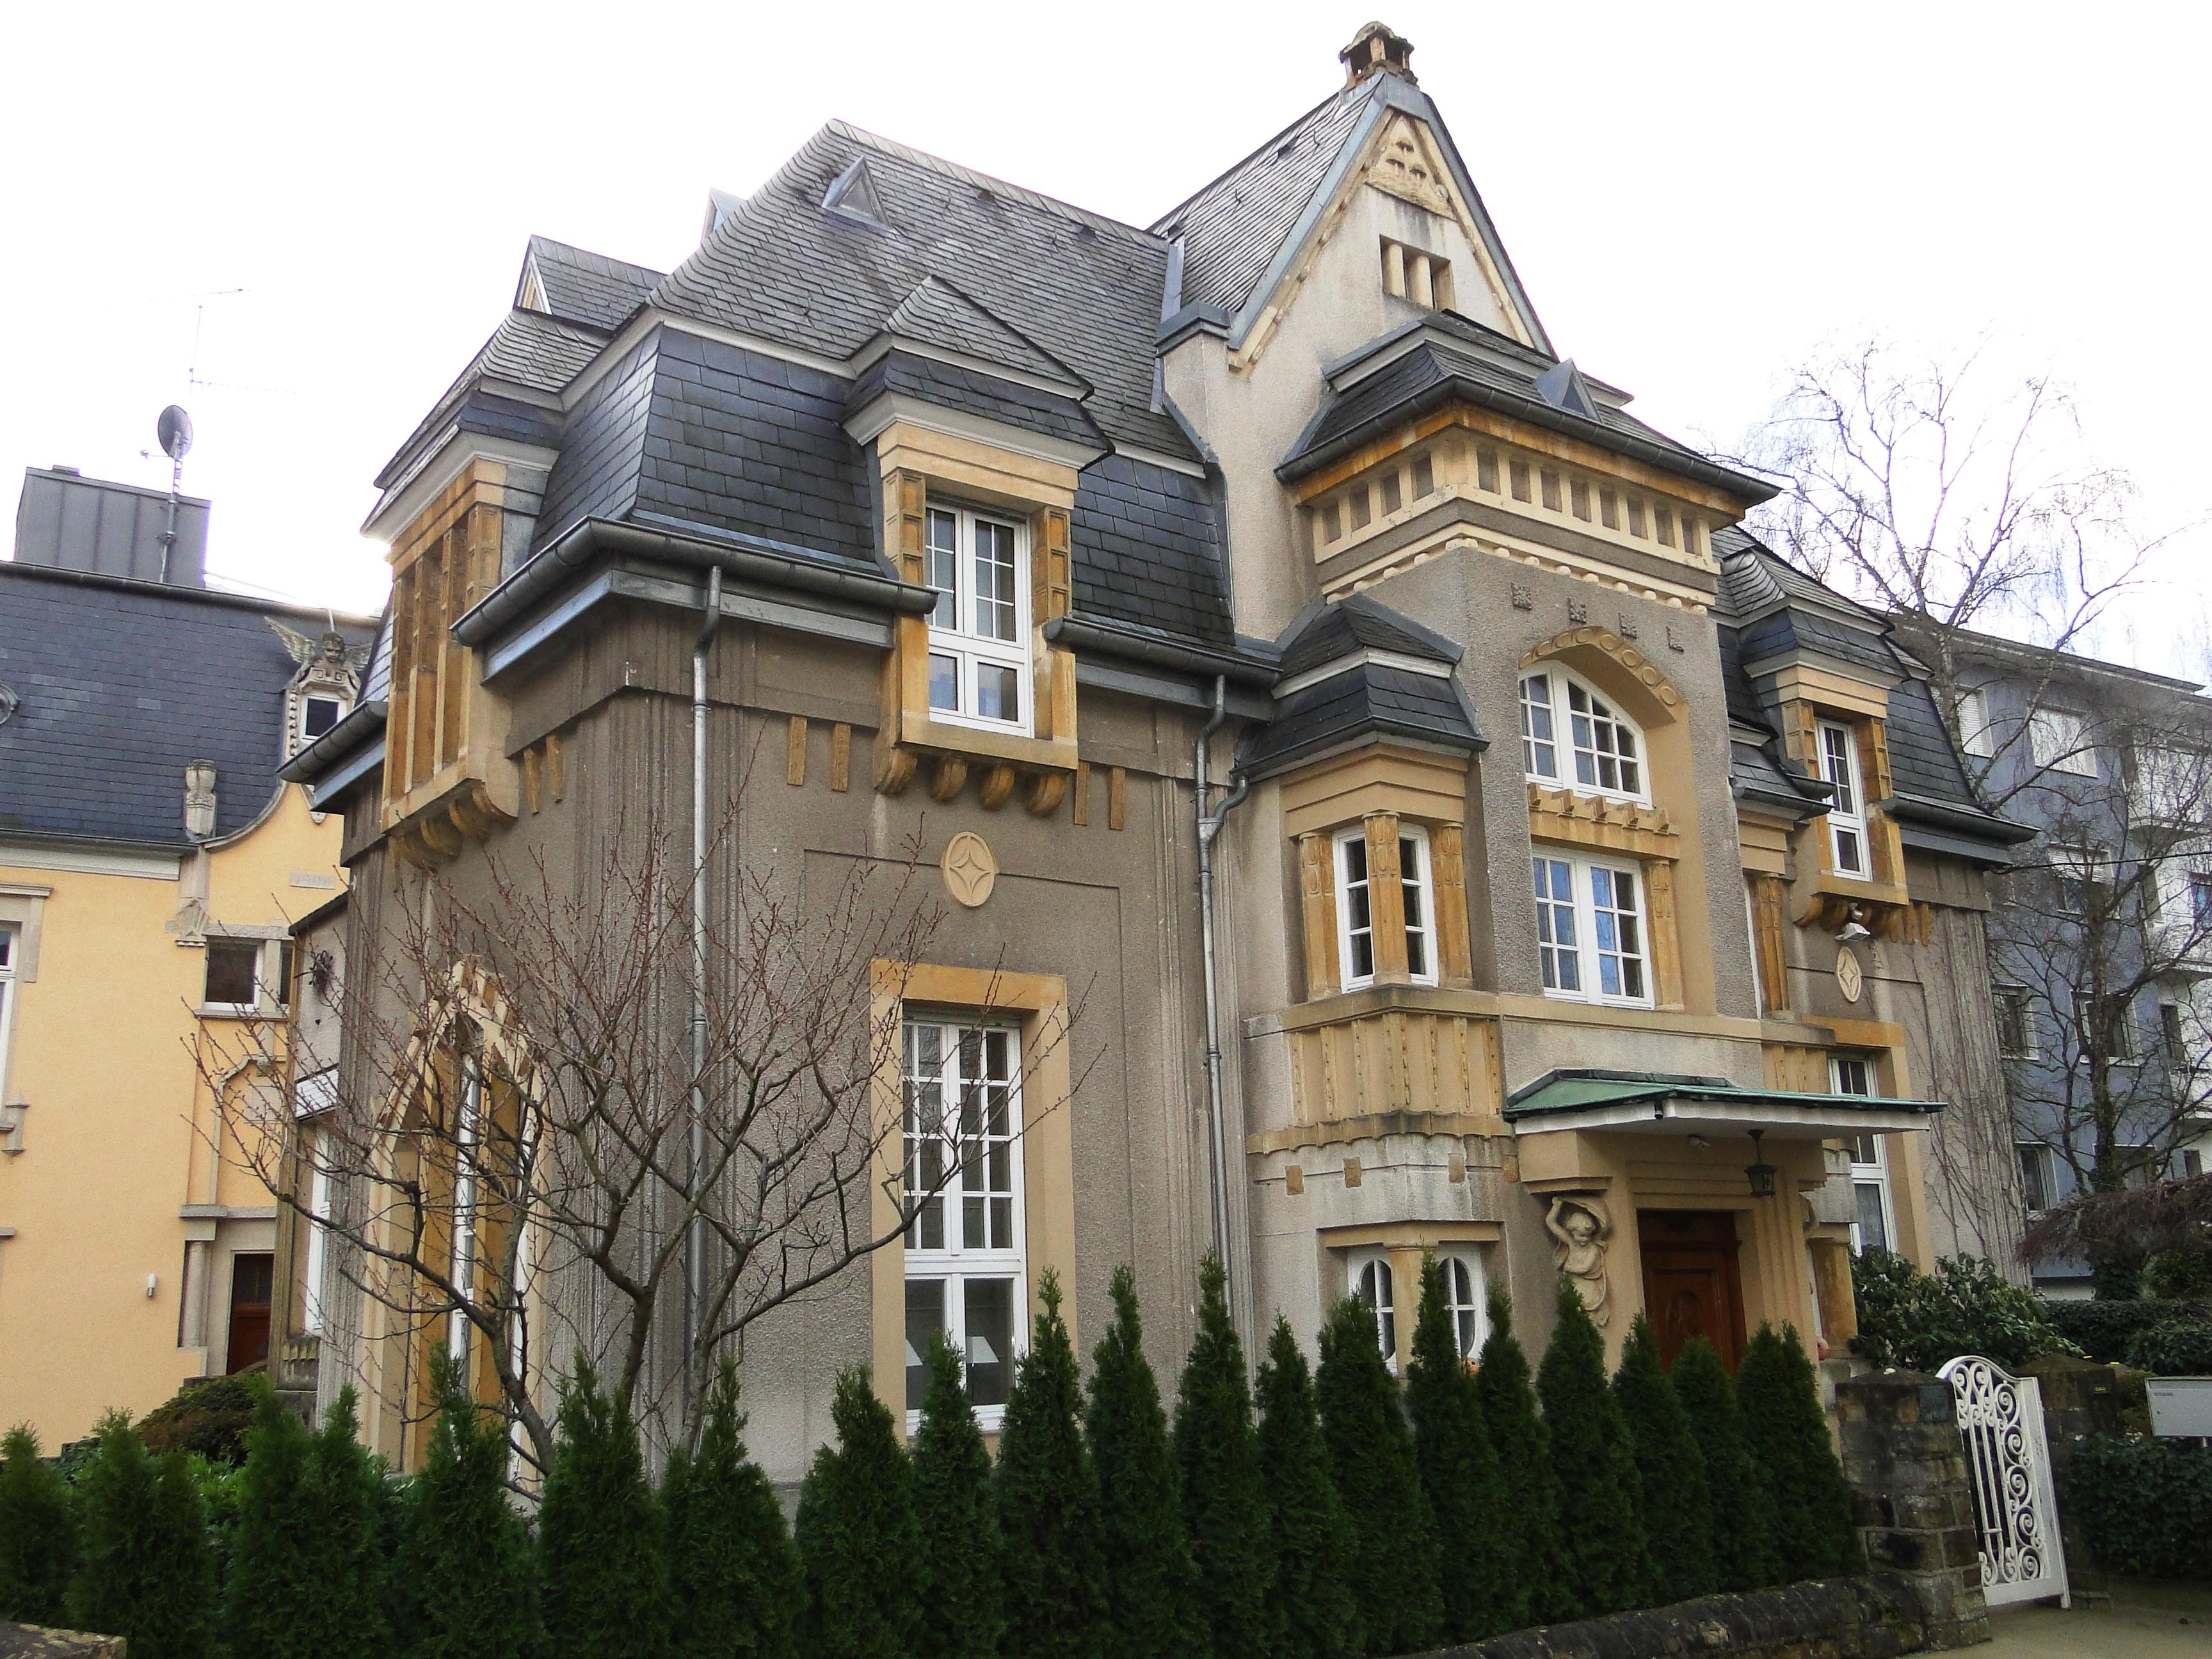 Fichier luxembourg 40 rue albert 1er 2 jpg wikipedia for Maison moderne luxembourg wikipedia